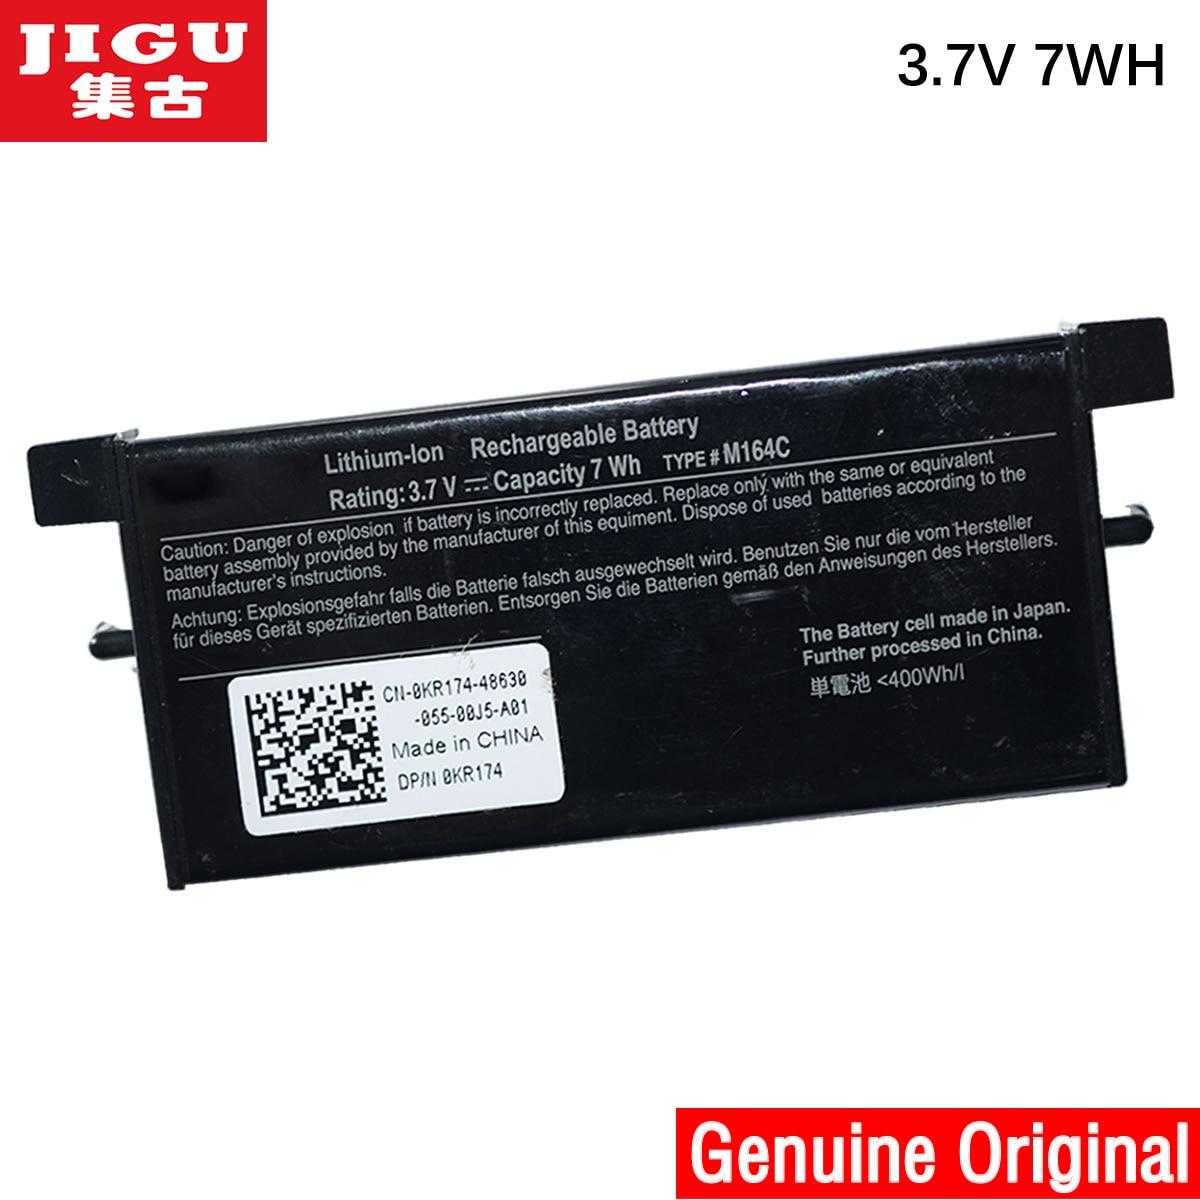 Batería Original para ordenador portátil jgu GC9R0 KR174 M164C M9602 X8483 para DELL PERC 5/E 6/E H700 H800